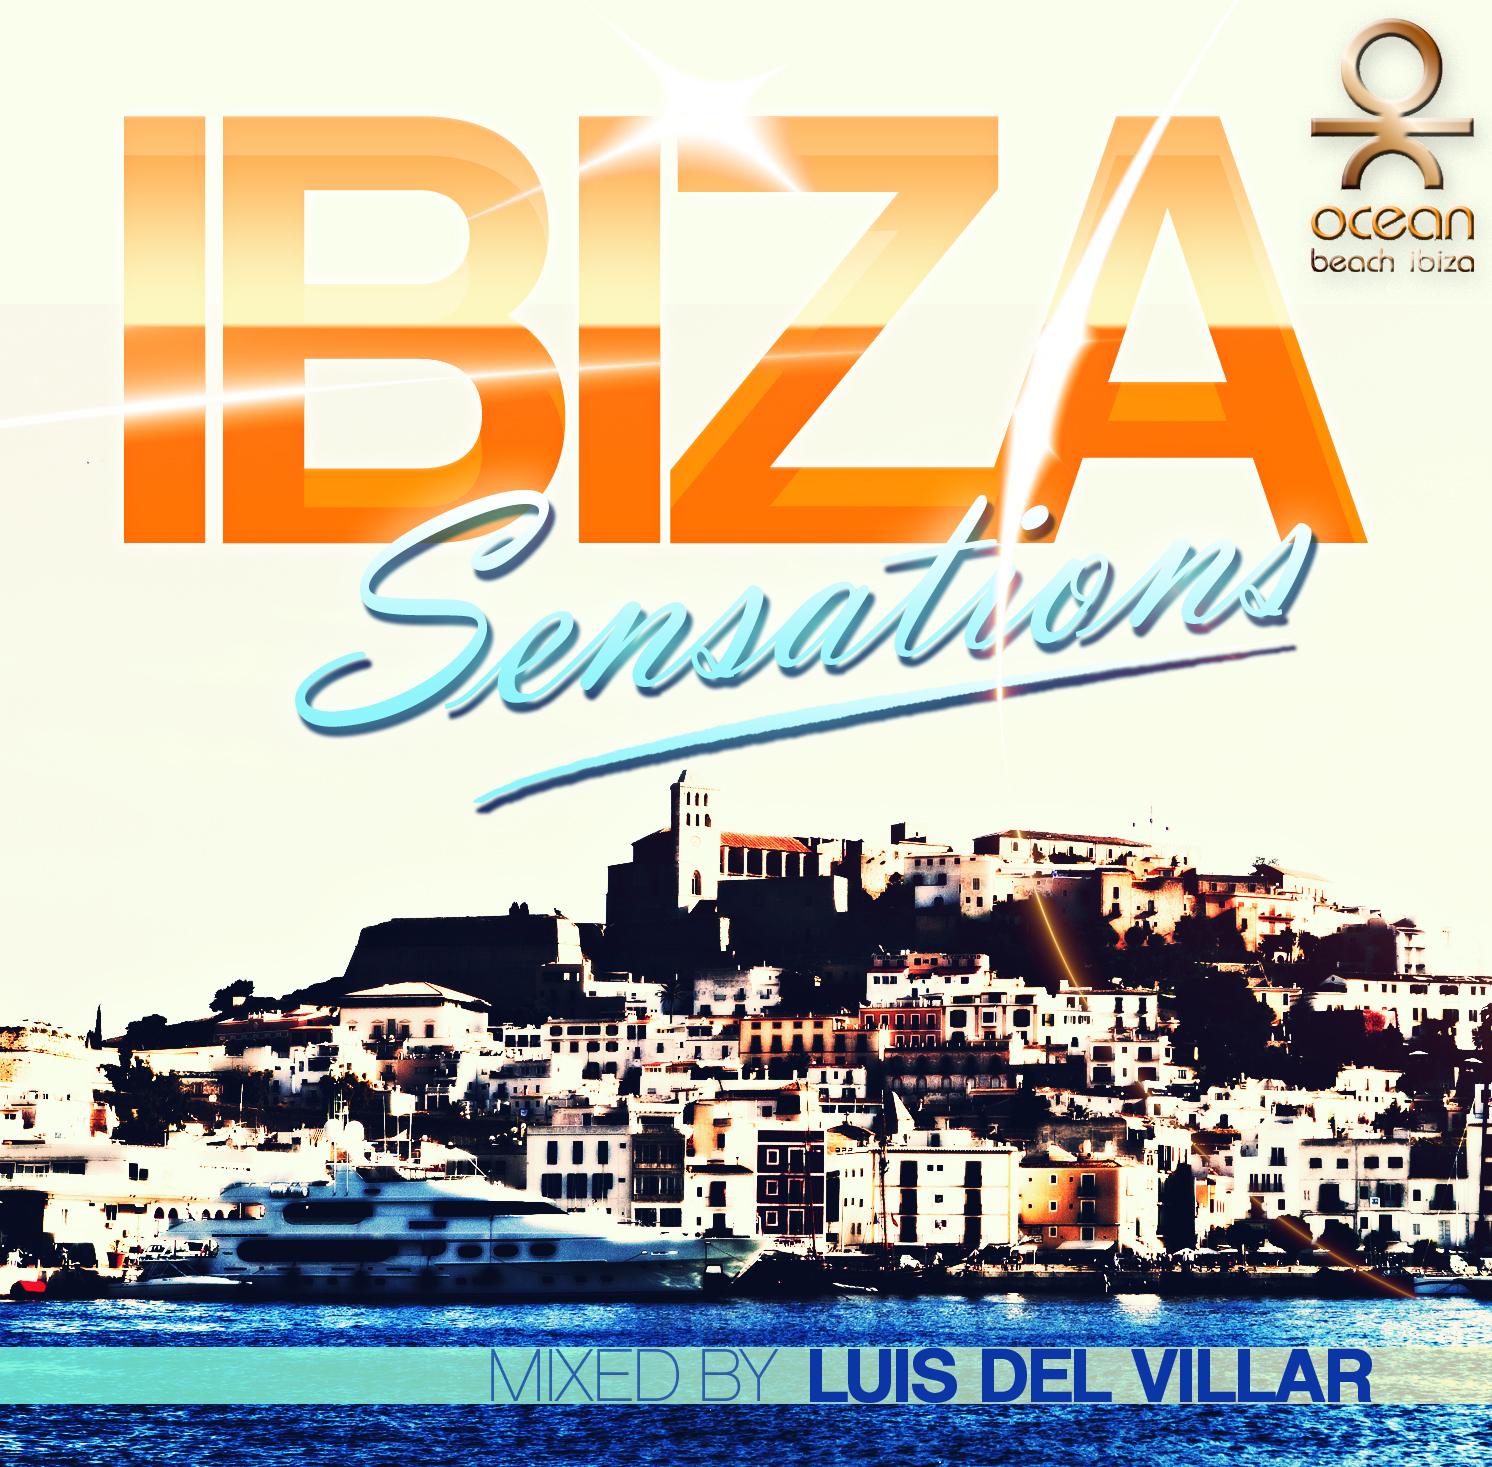 Ibiza Sensations 132 @ 070borrel party, Kurhaus Hotel Scheveningen, Holland next march 4th